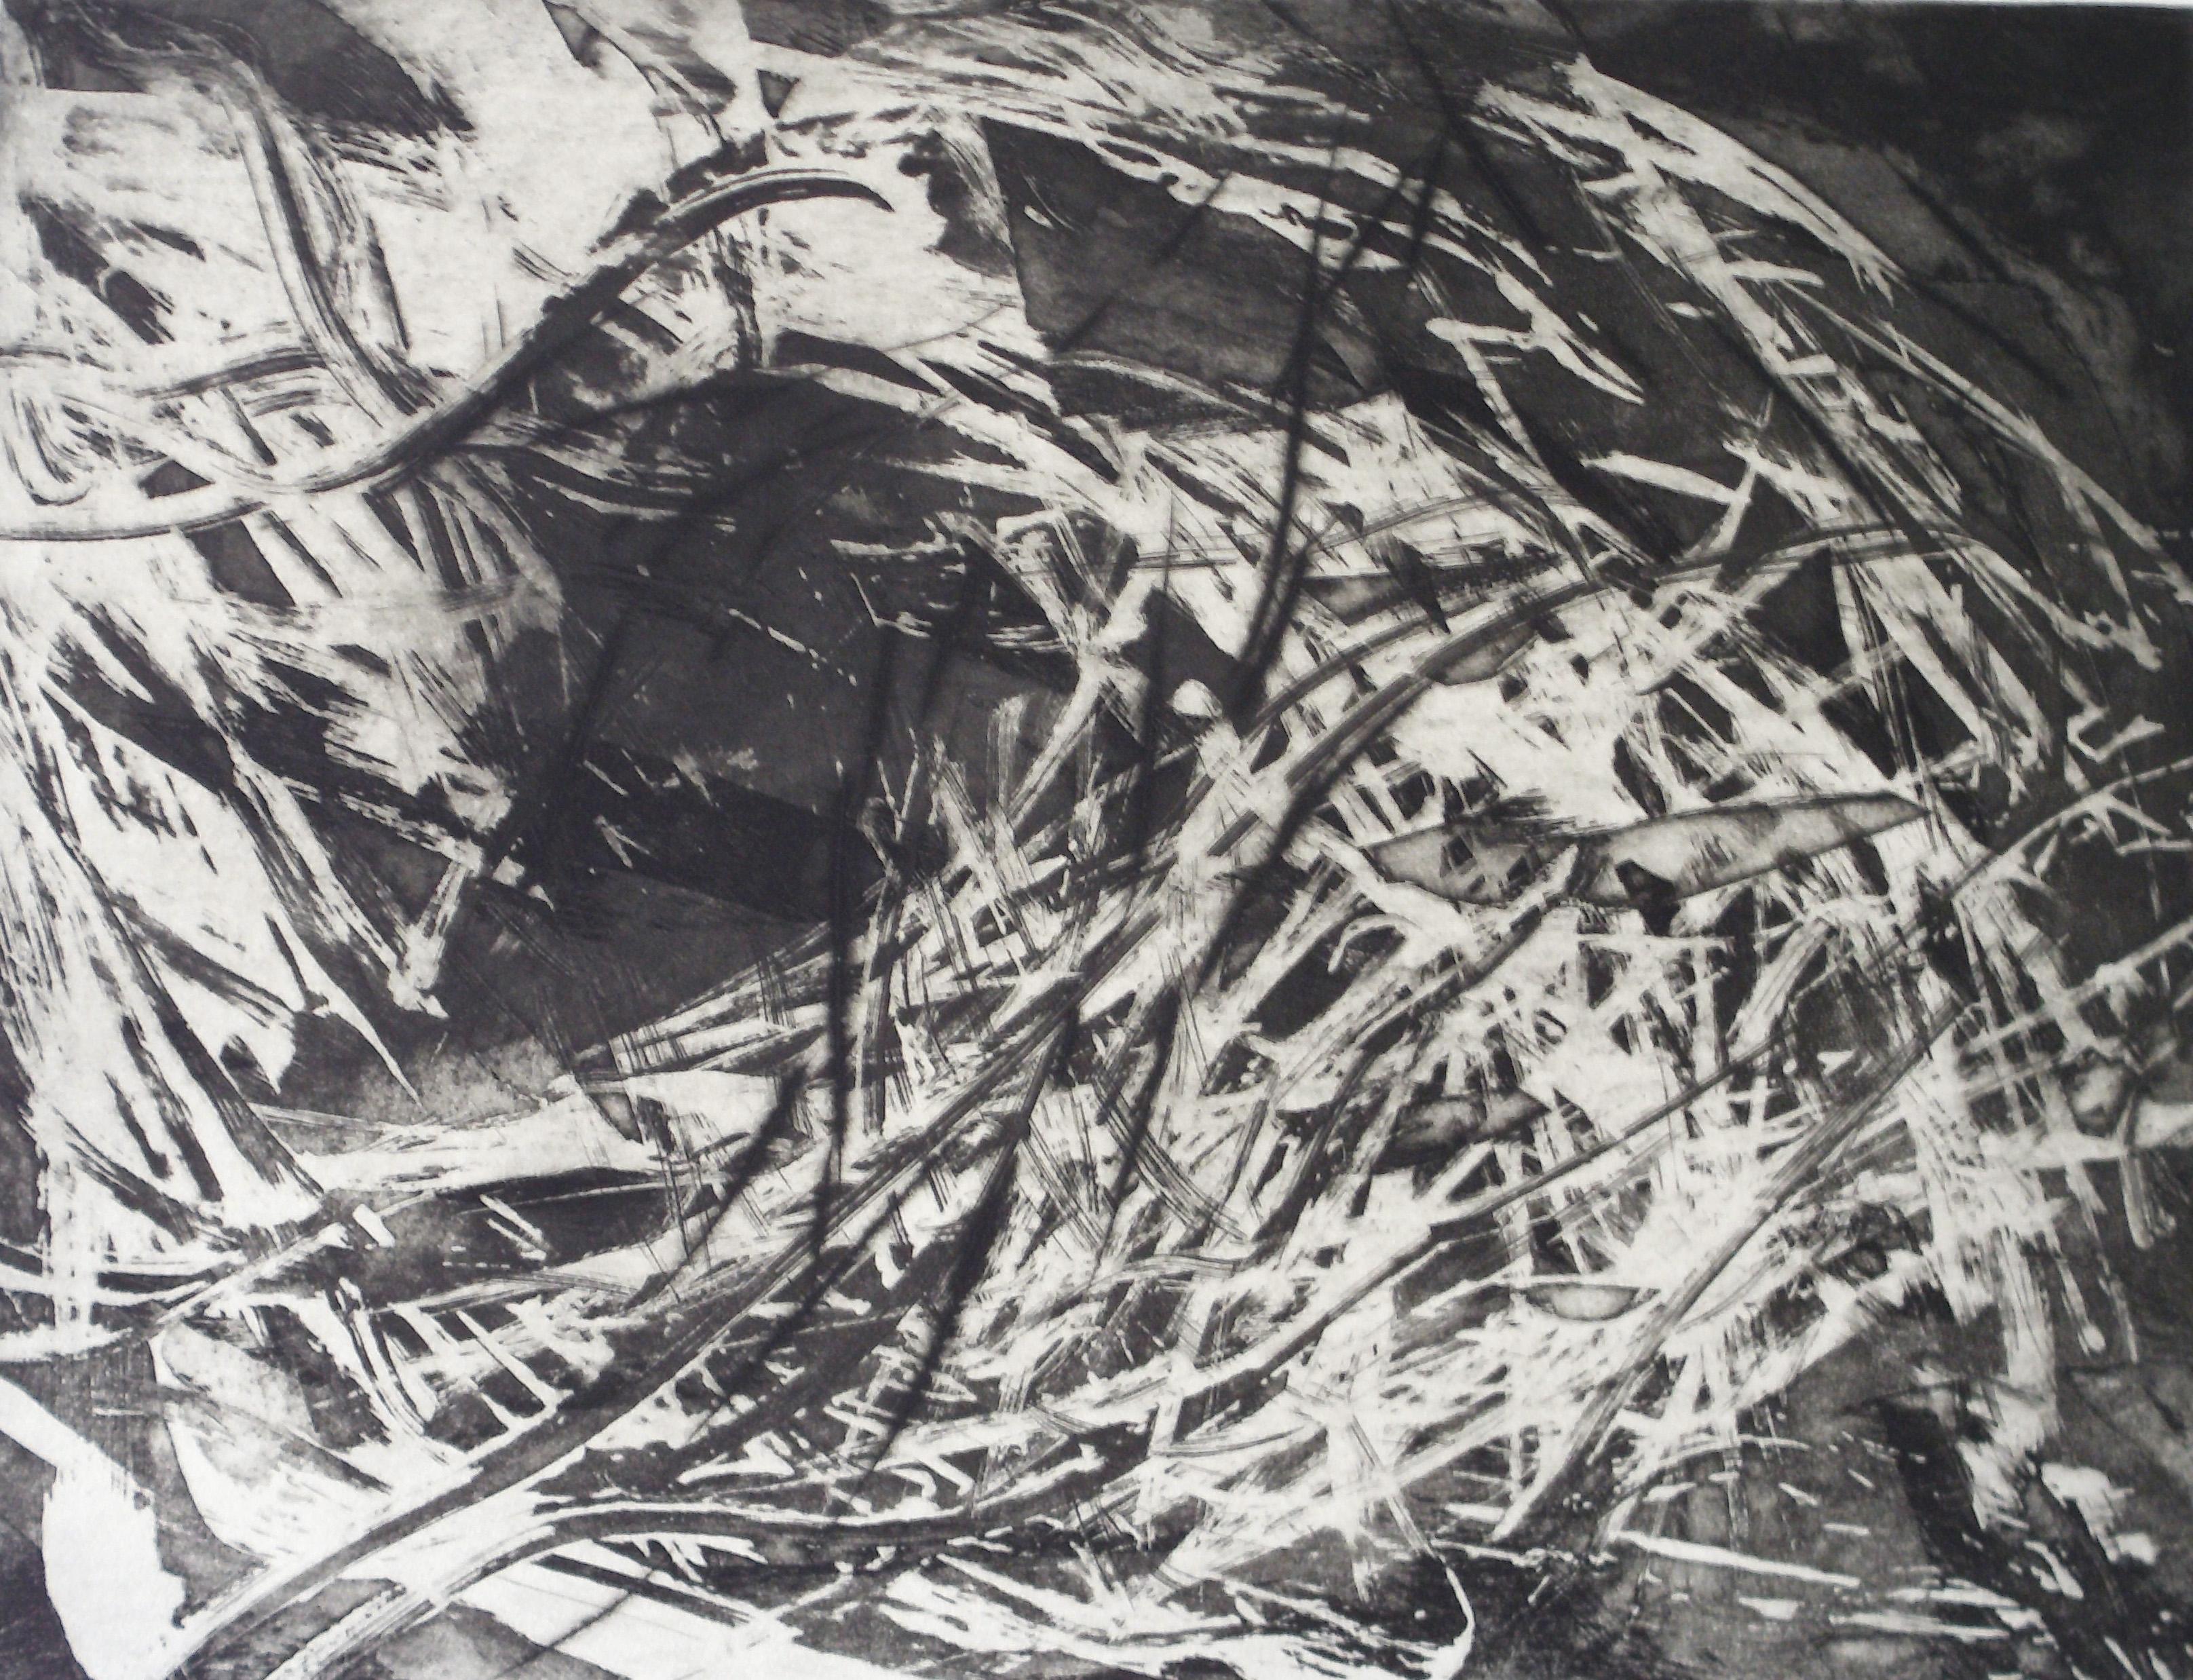 16-kerstin_franke-gneuss-windbruch-2011-aquatinta_kaltnadelradierung-45.2x60.4